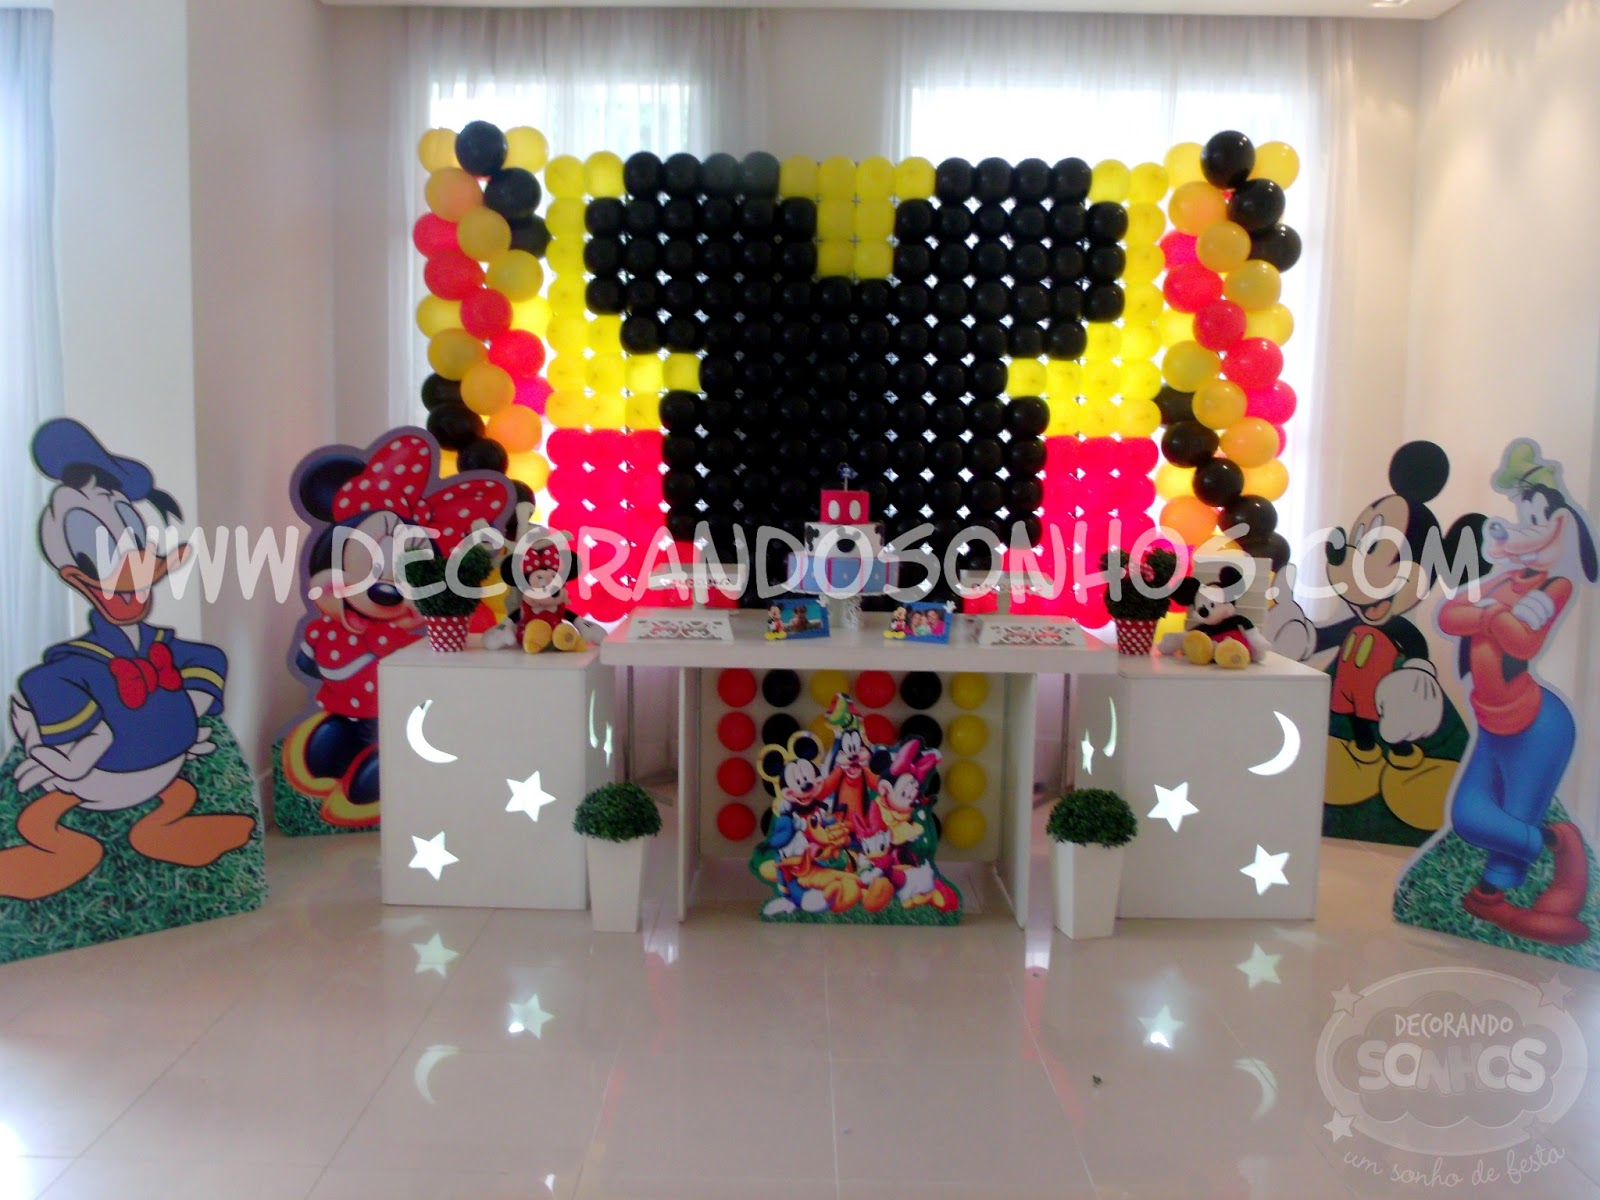 +festa+personalziada+do+mickey+festa+clena+turma+do+mickey+festa